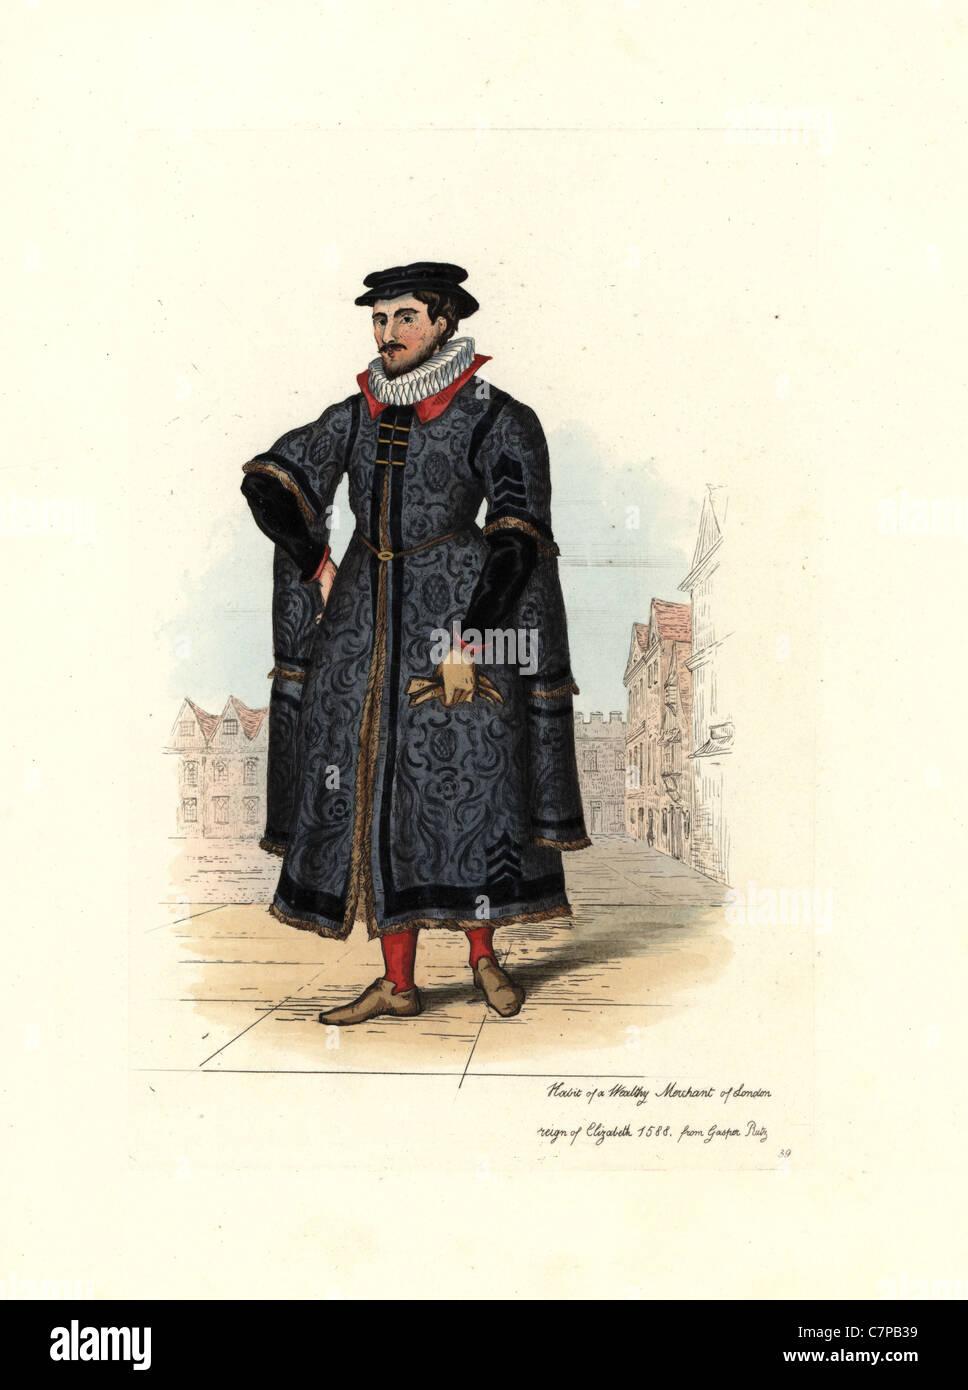 Habit of a wealthy London merchant, time of Elizabeth I. - Stock Image